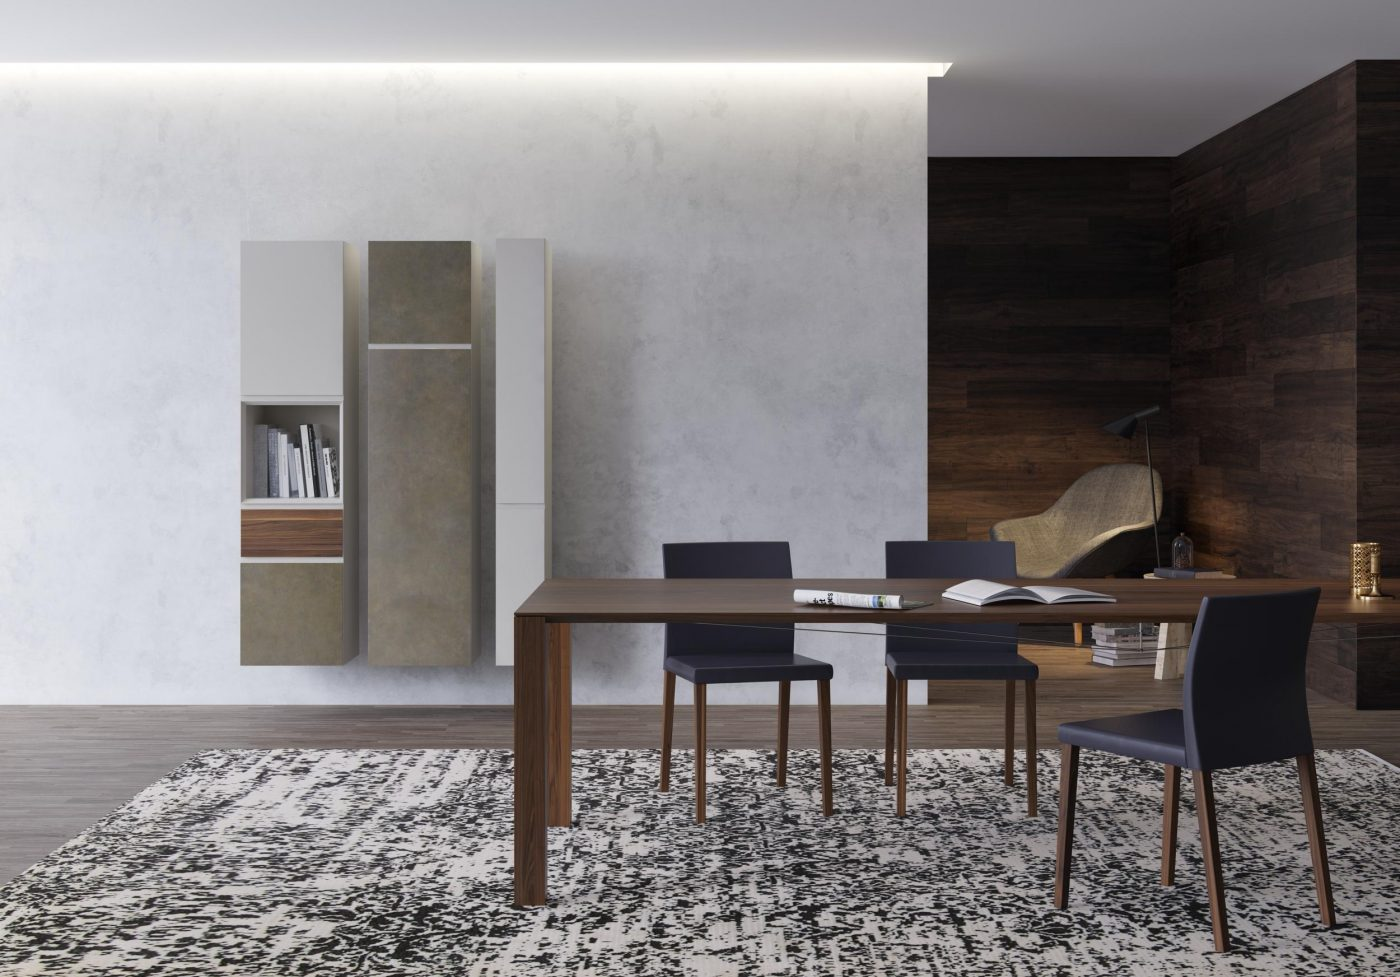 Hemelaer-Interior-Willisau-Varino Vero Fuga